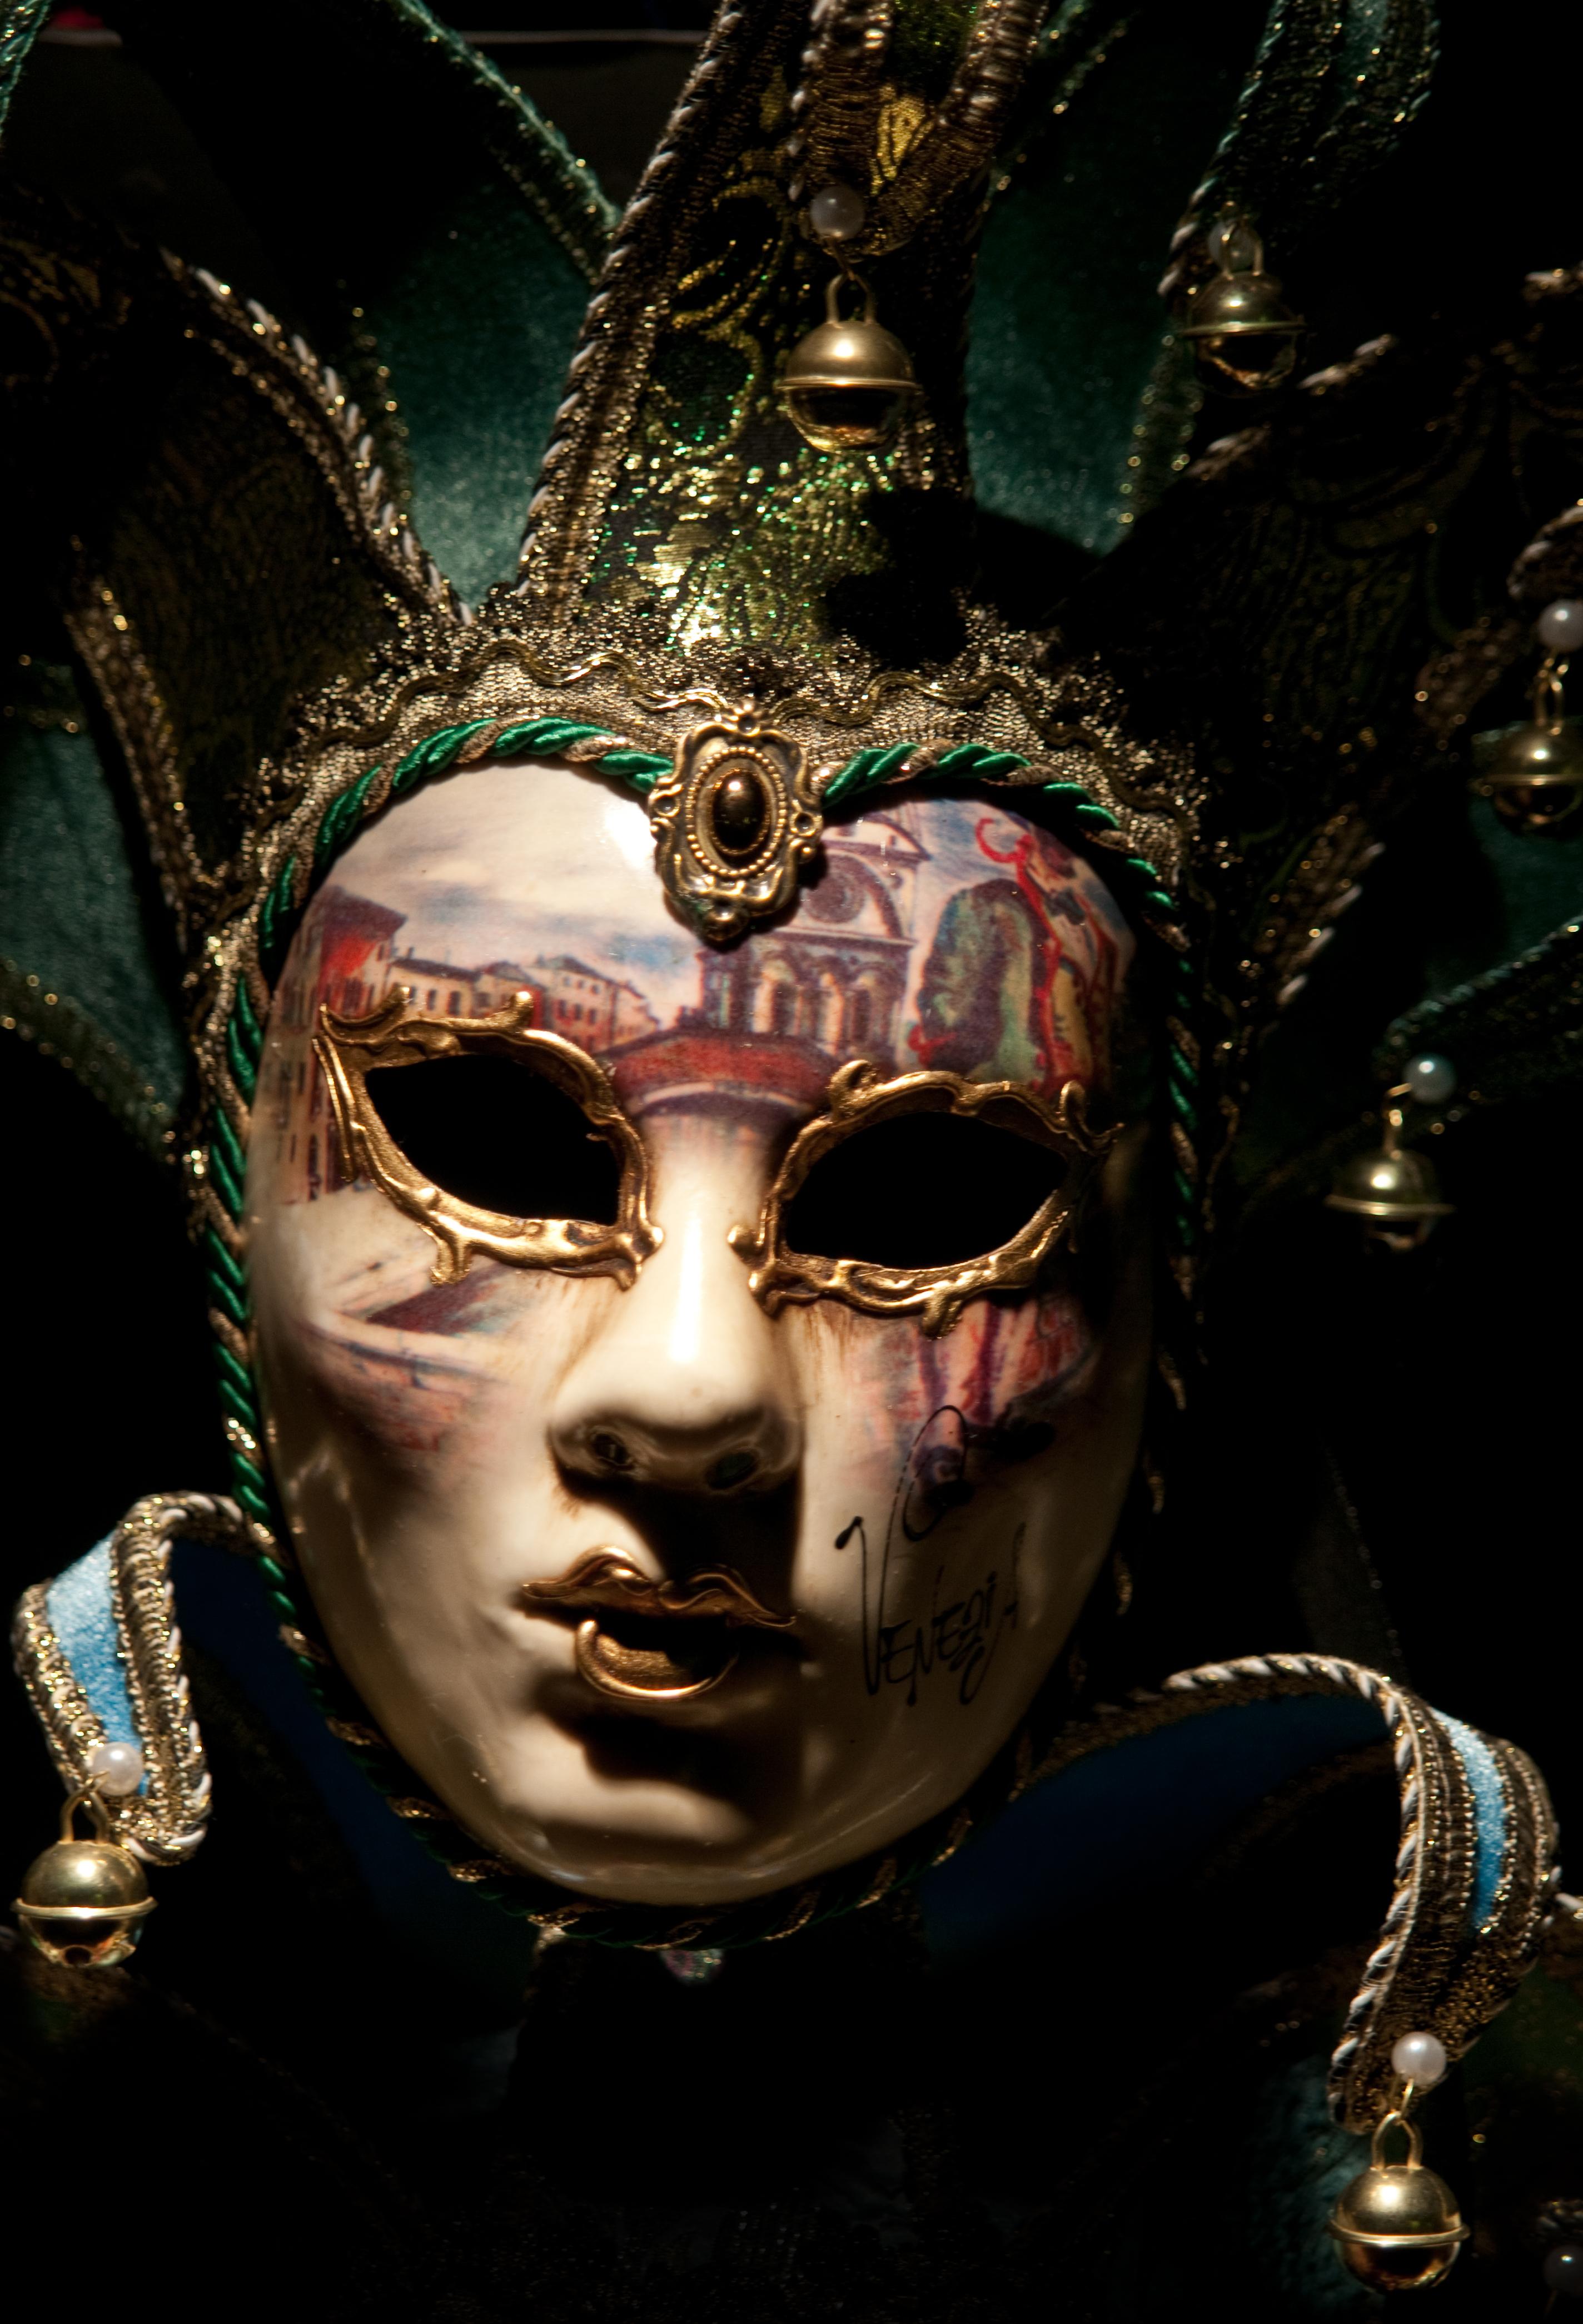 Maschera nella notte_5495425152_o